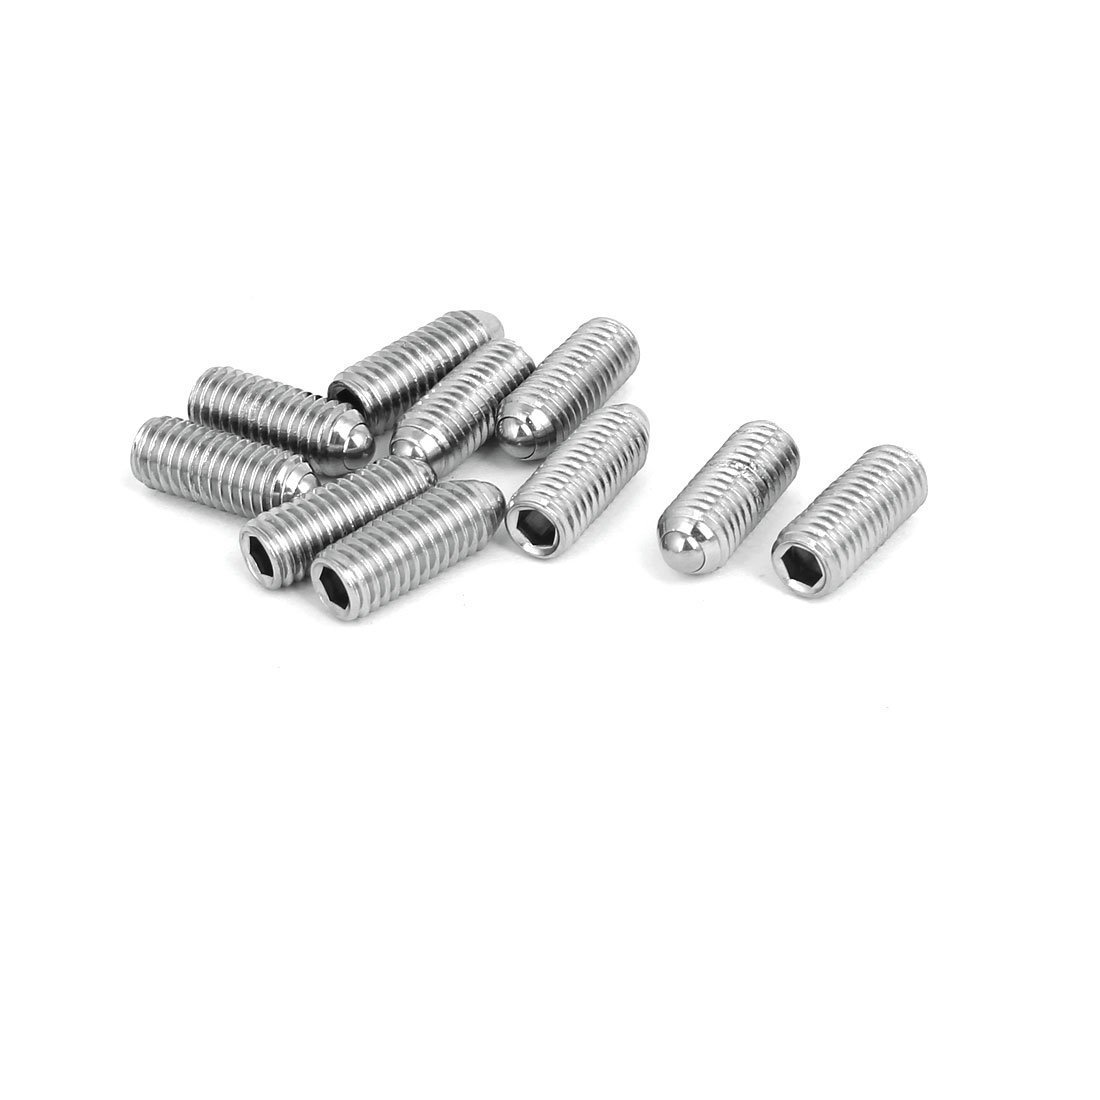 sourcingmap® M8x20mm Tornillo Prisionero de muelle de acero inoxidable 304 con punta de bola hexagonal 10pcs a16122300ux0149